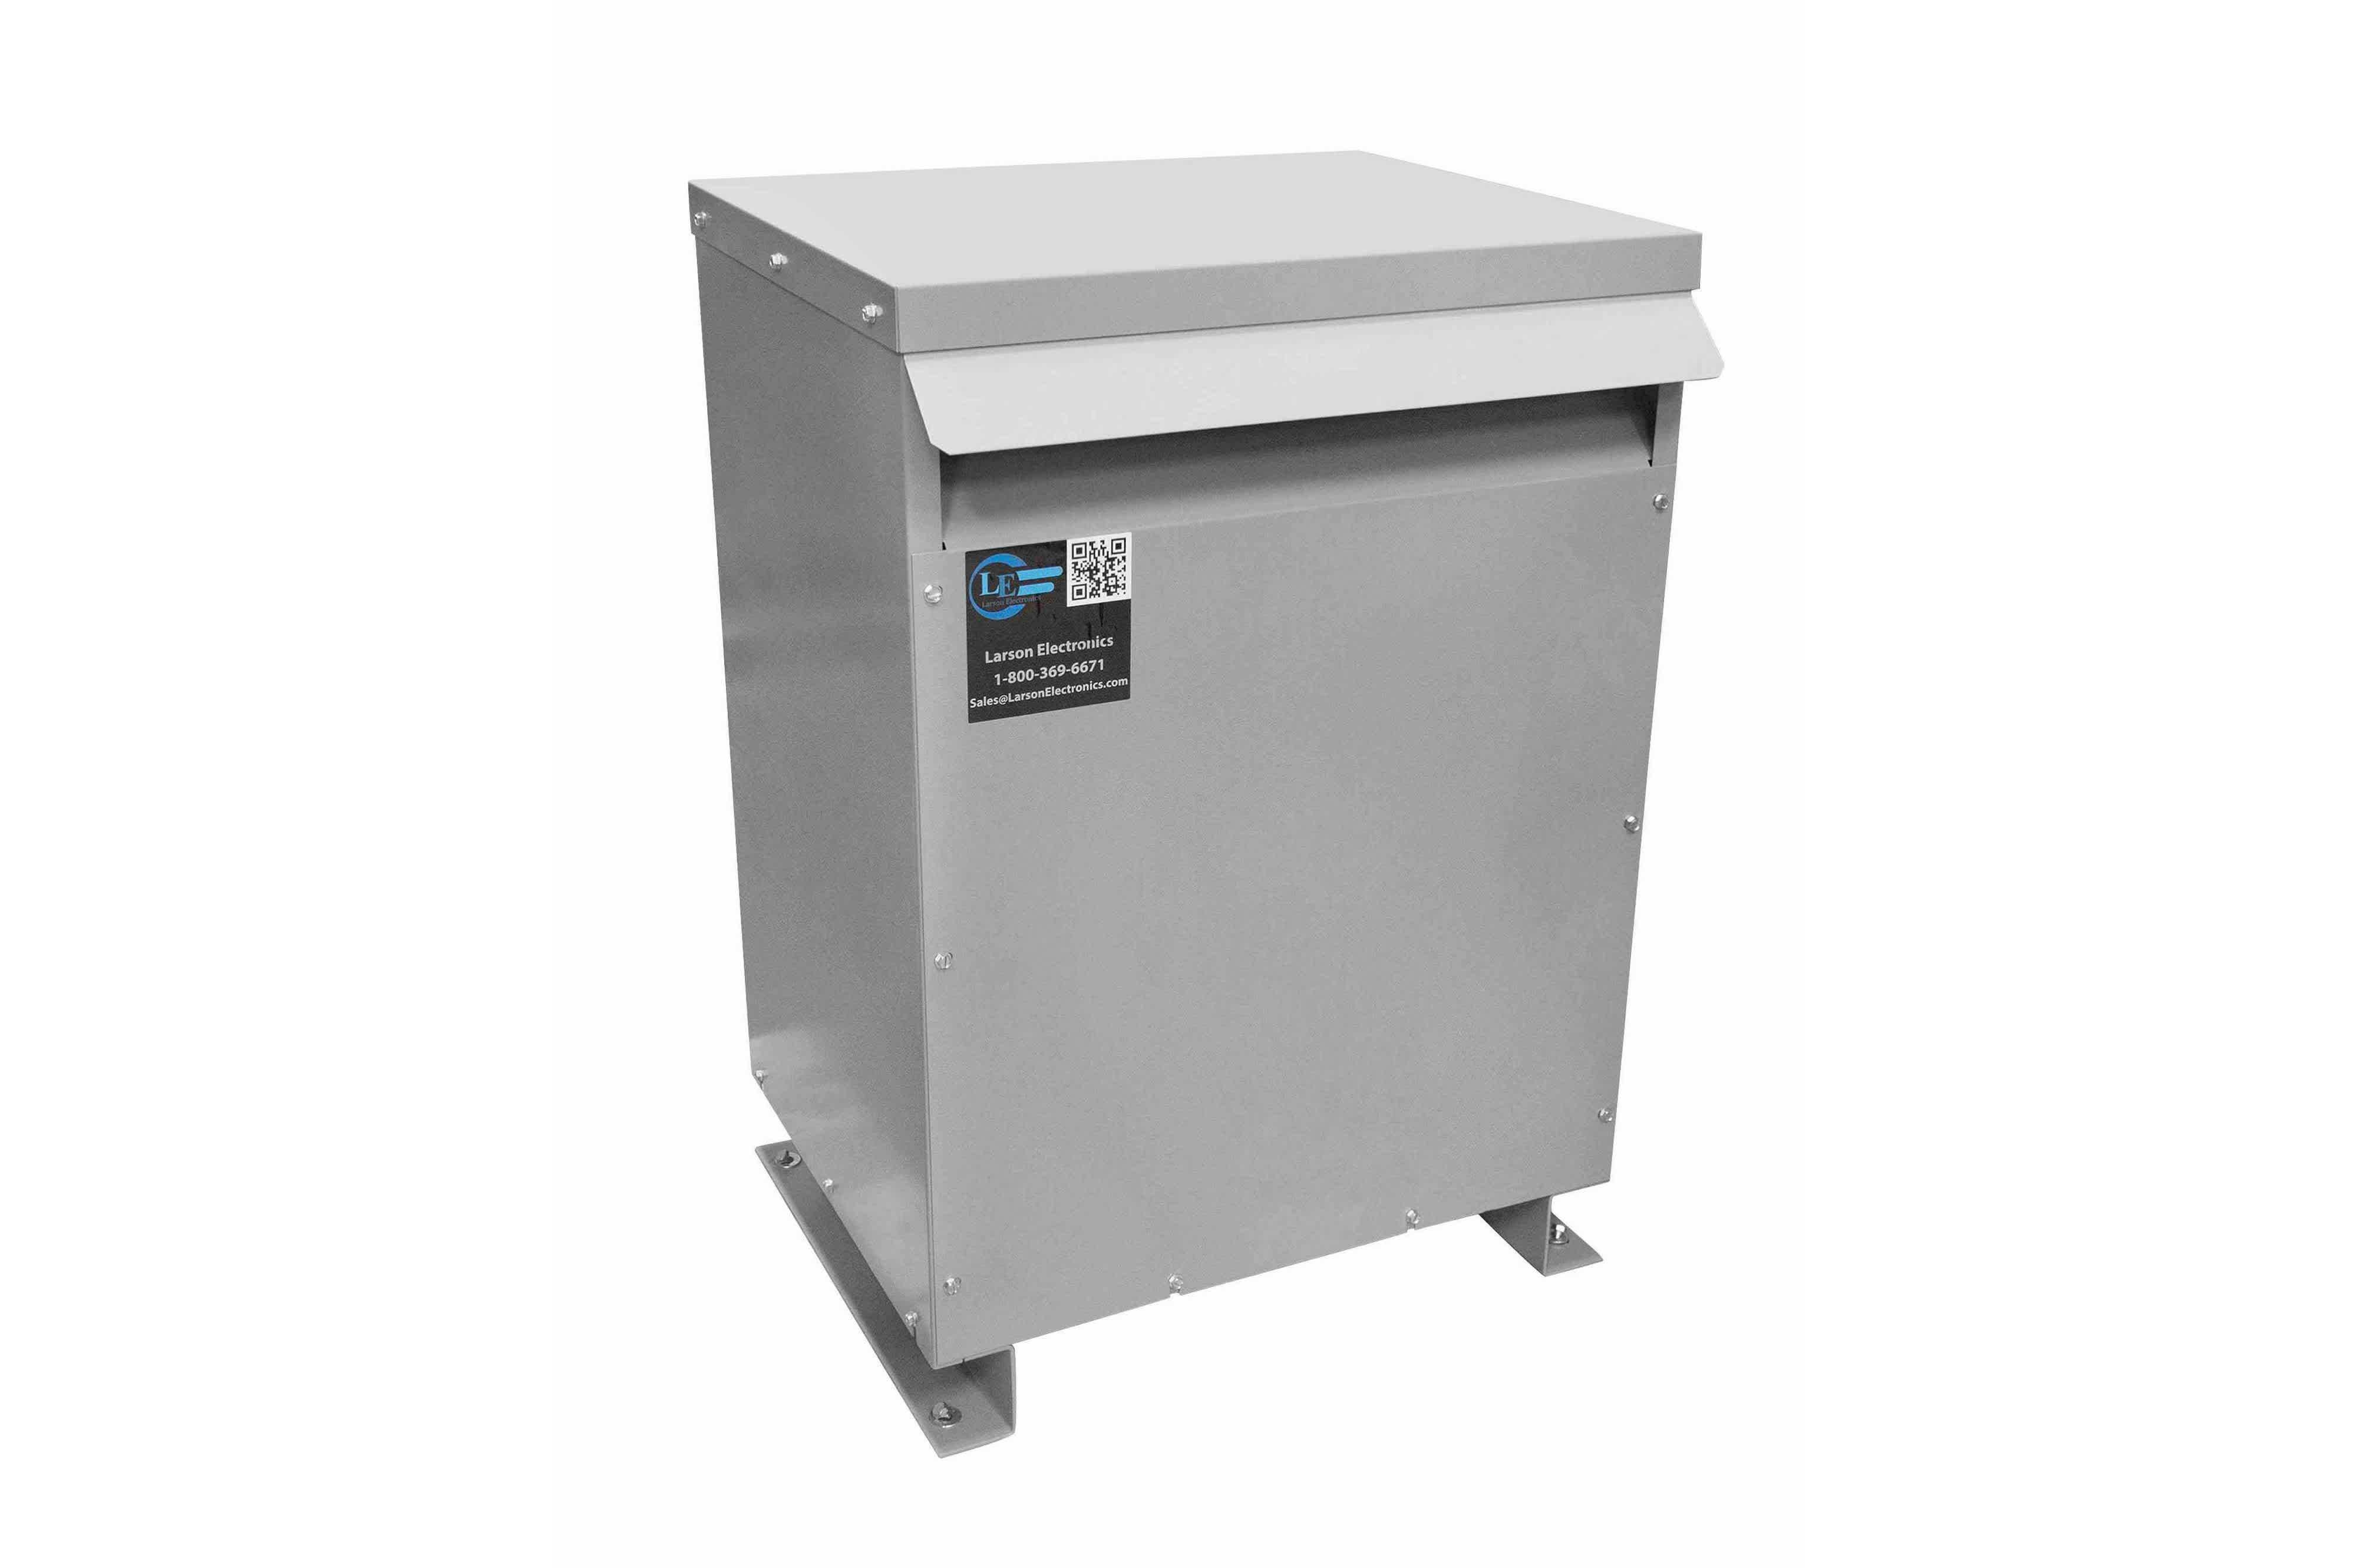 50 kVA 3PH Isolation Transformer, 415V Wye Primary, 240V/120 Delta Secondary, N3R, Ventilated, 60 Hz